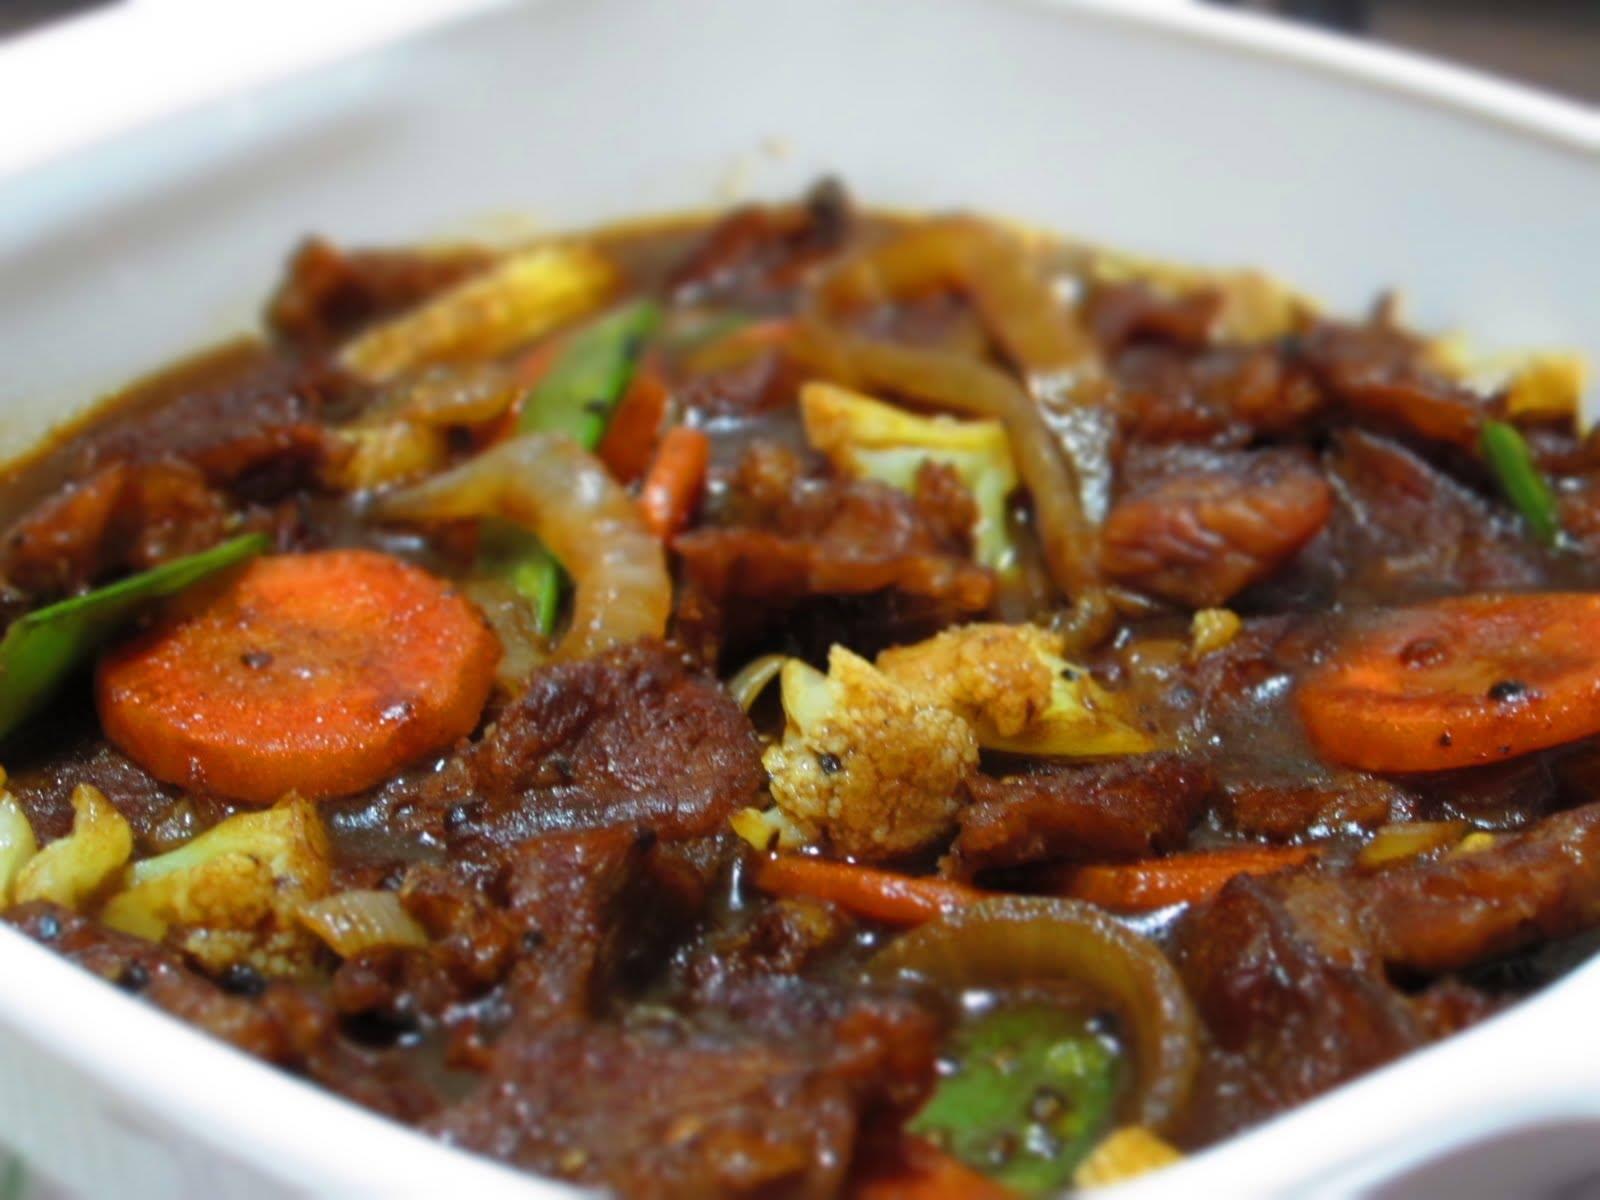 resepi-daging-masak-lada-hitam